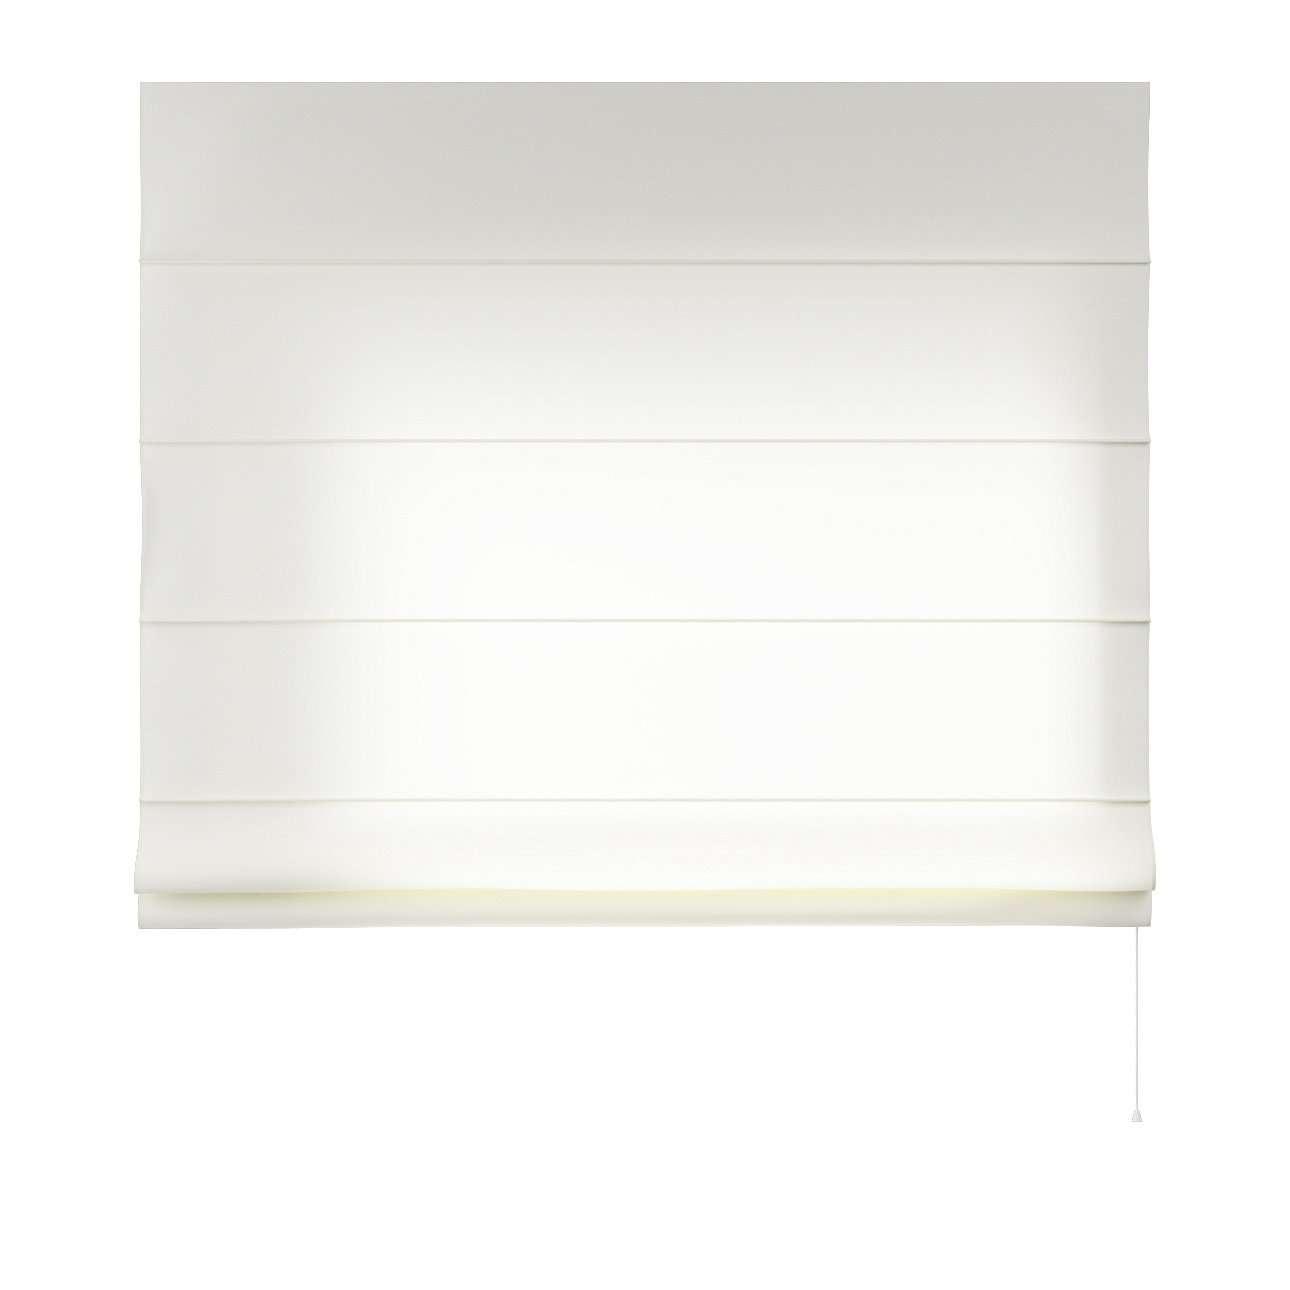 Foldegardin Capri<br/>Uden flæsekant 80 x 170 cm fra kollektionen Jupiter, Stof: 127-00